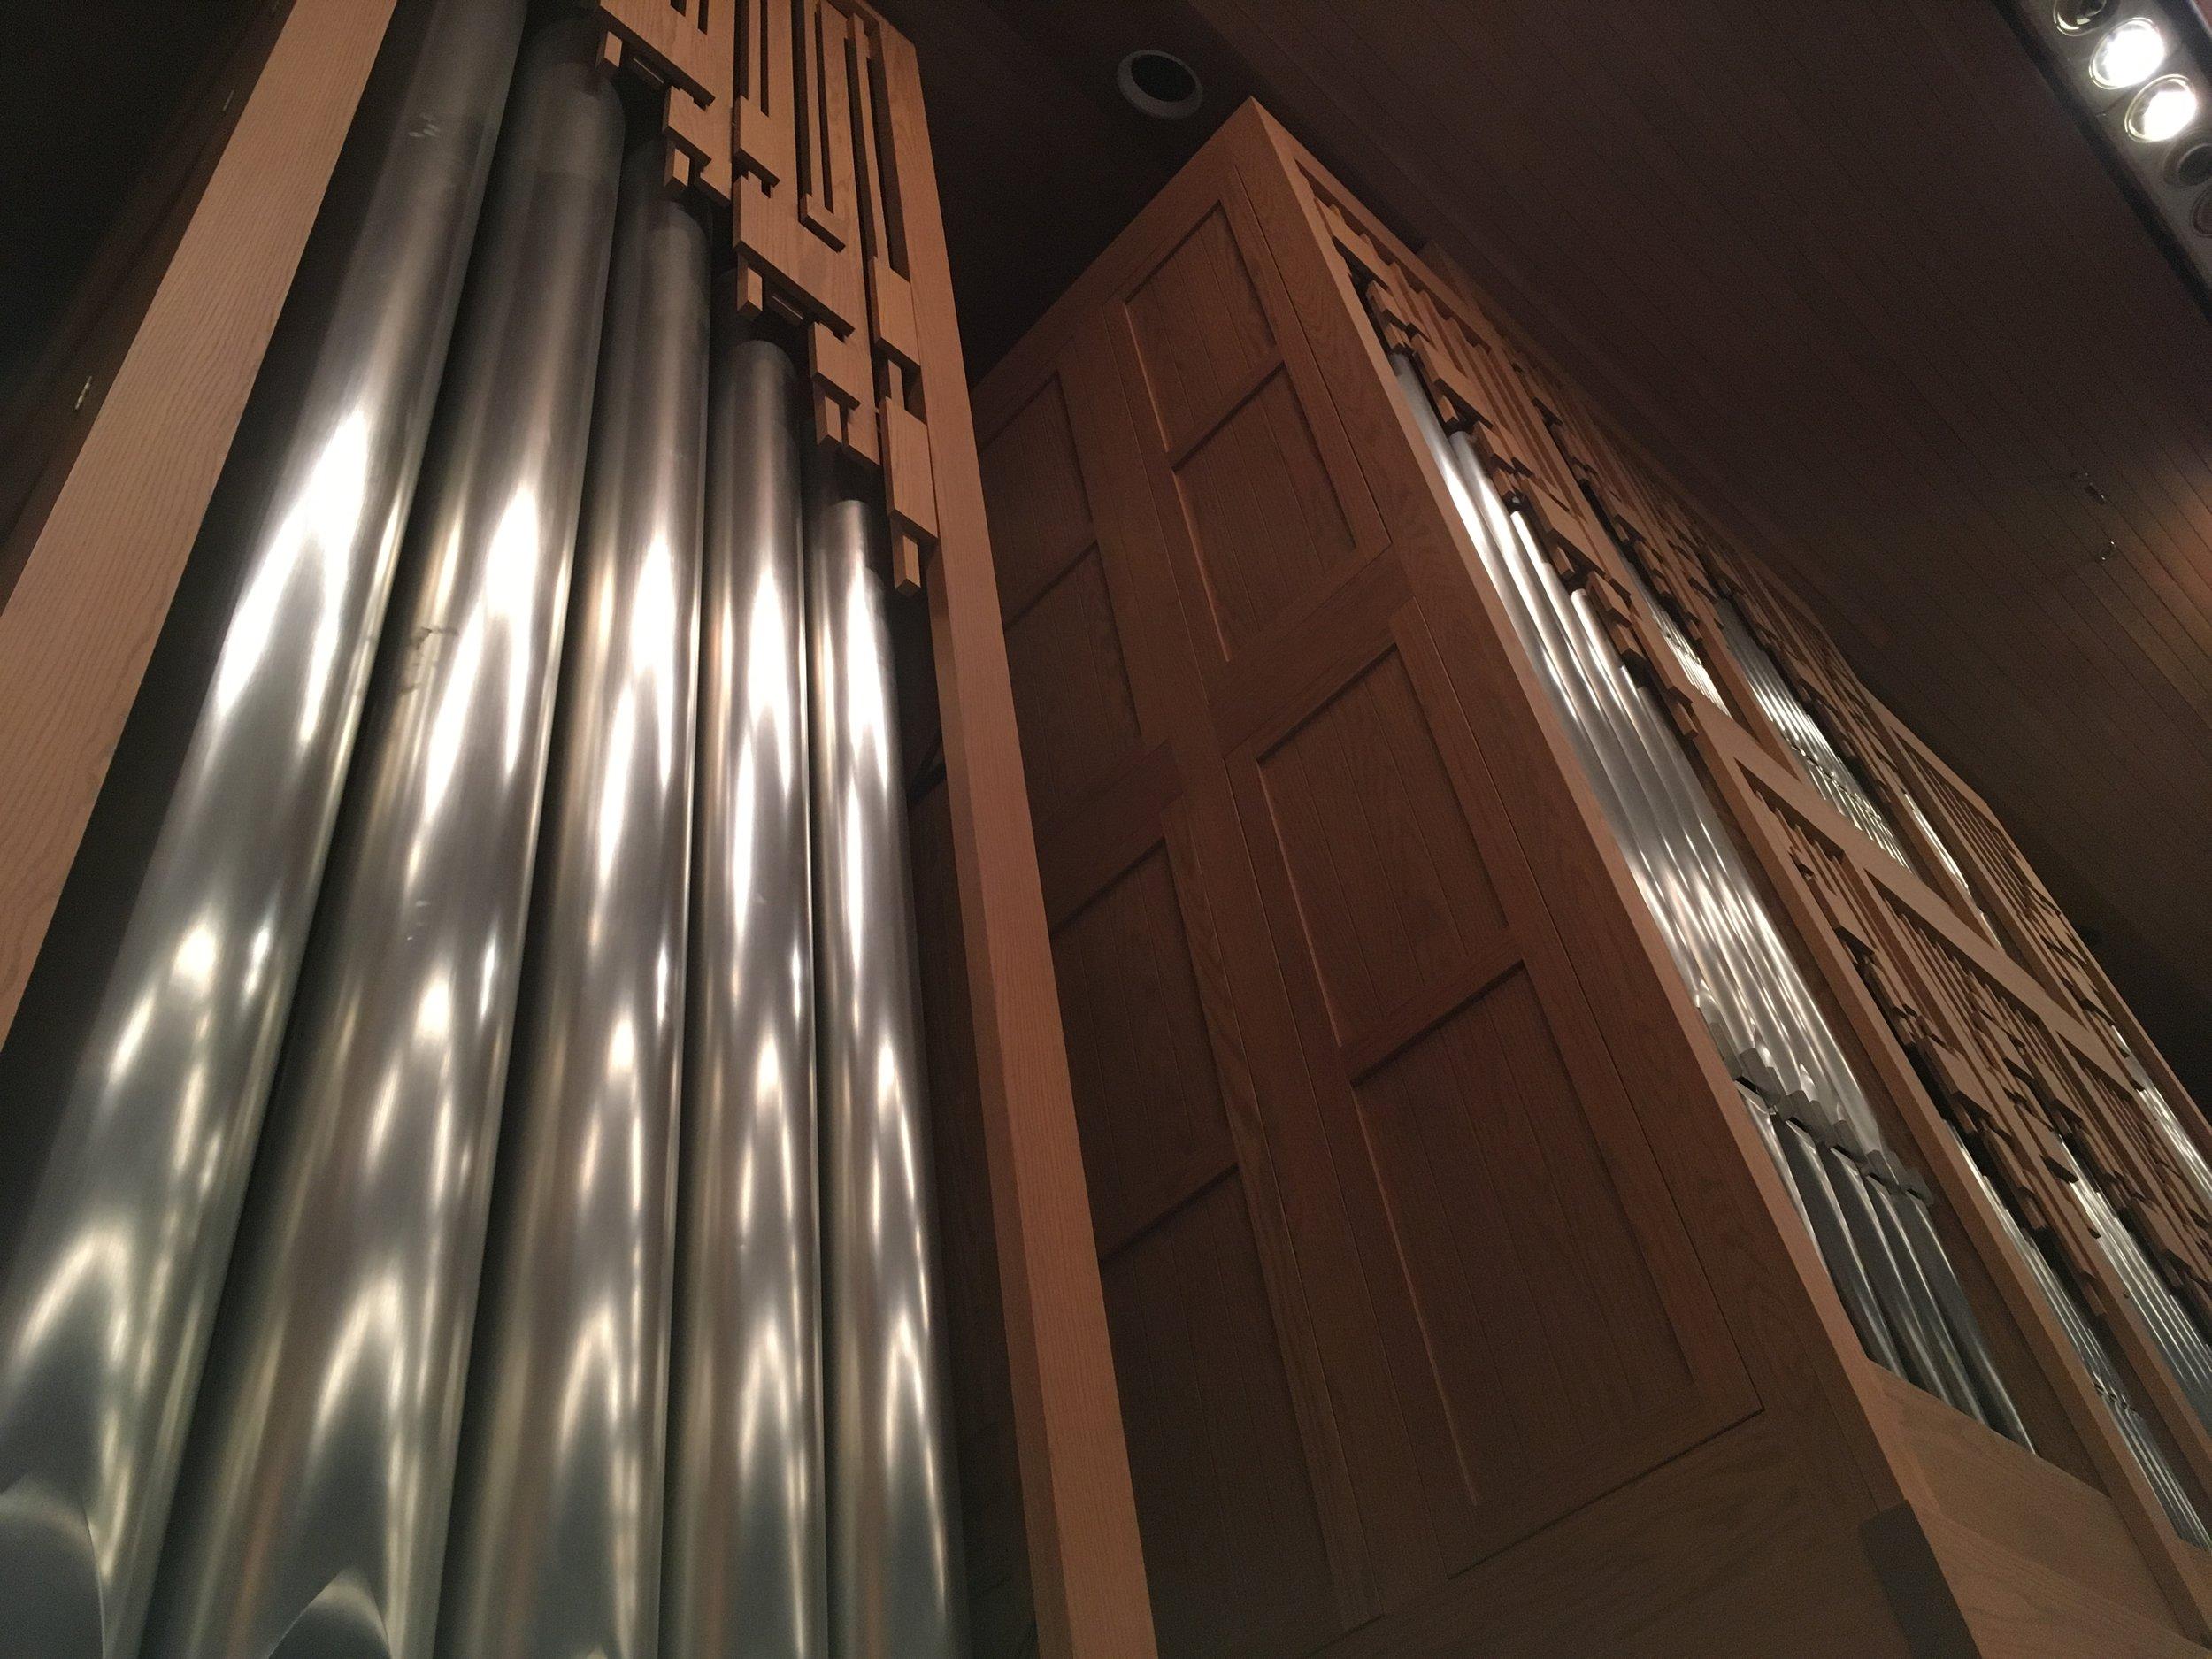 UTSA Recital Hall - Casavant Frères